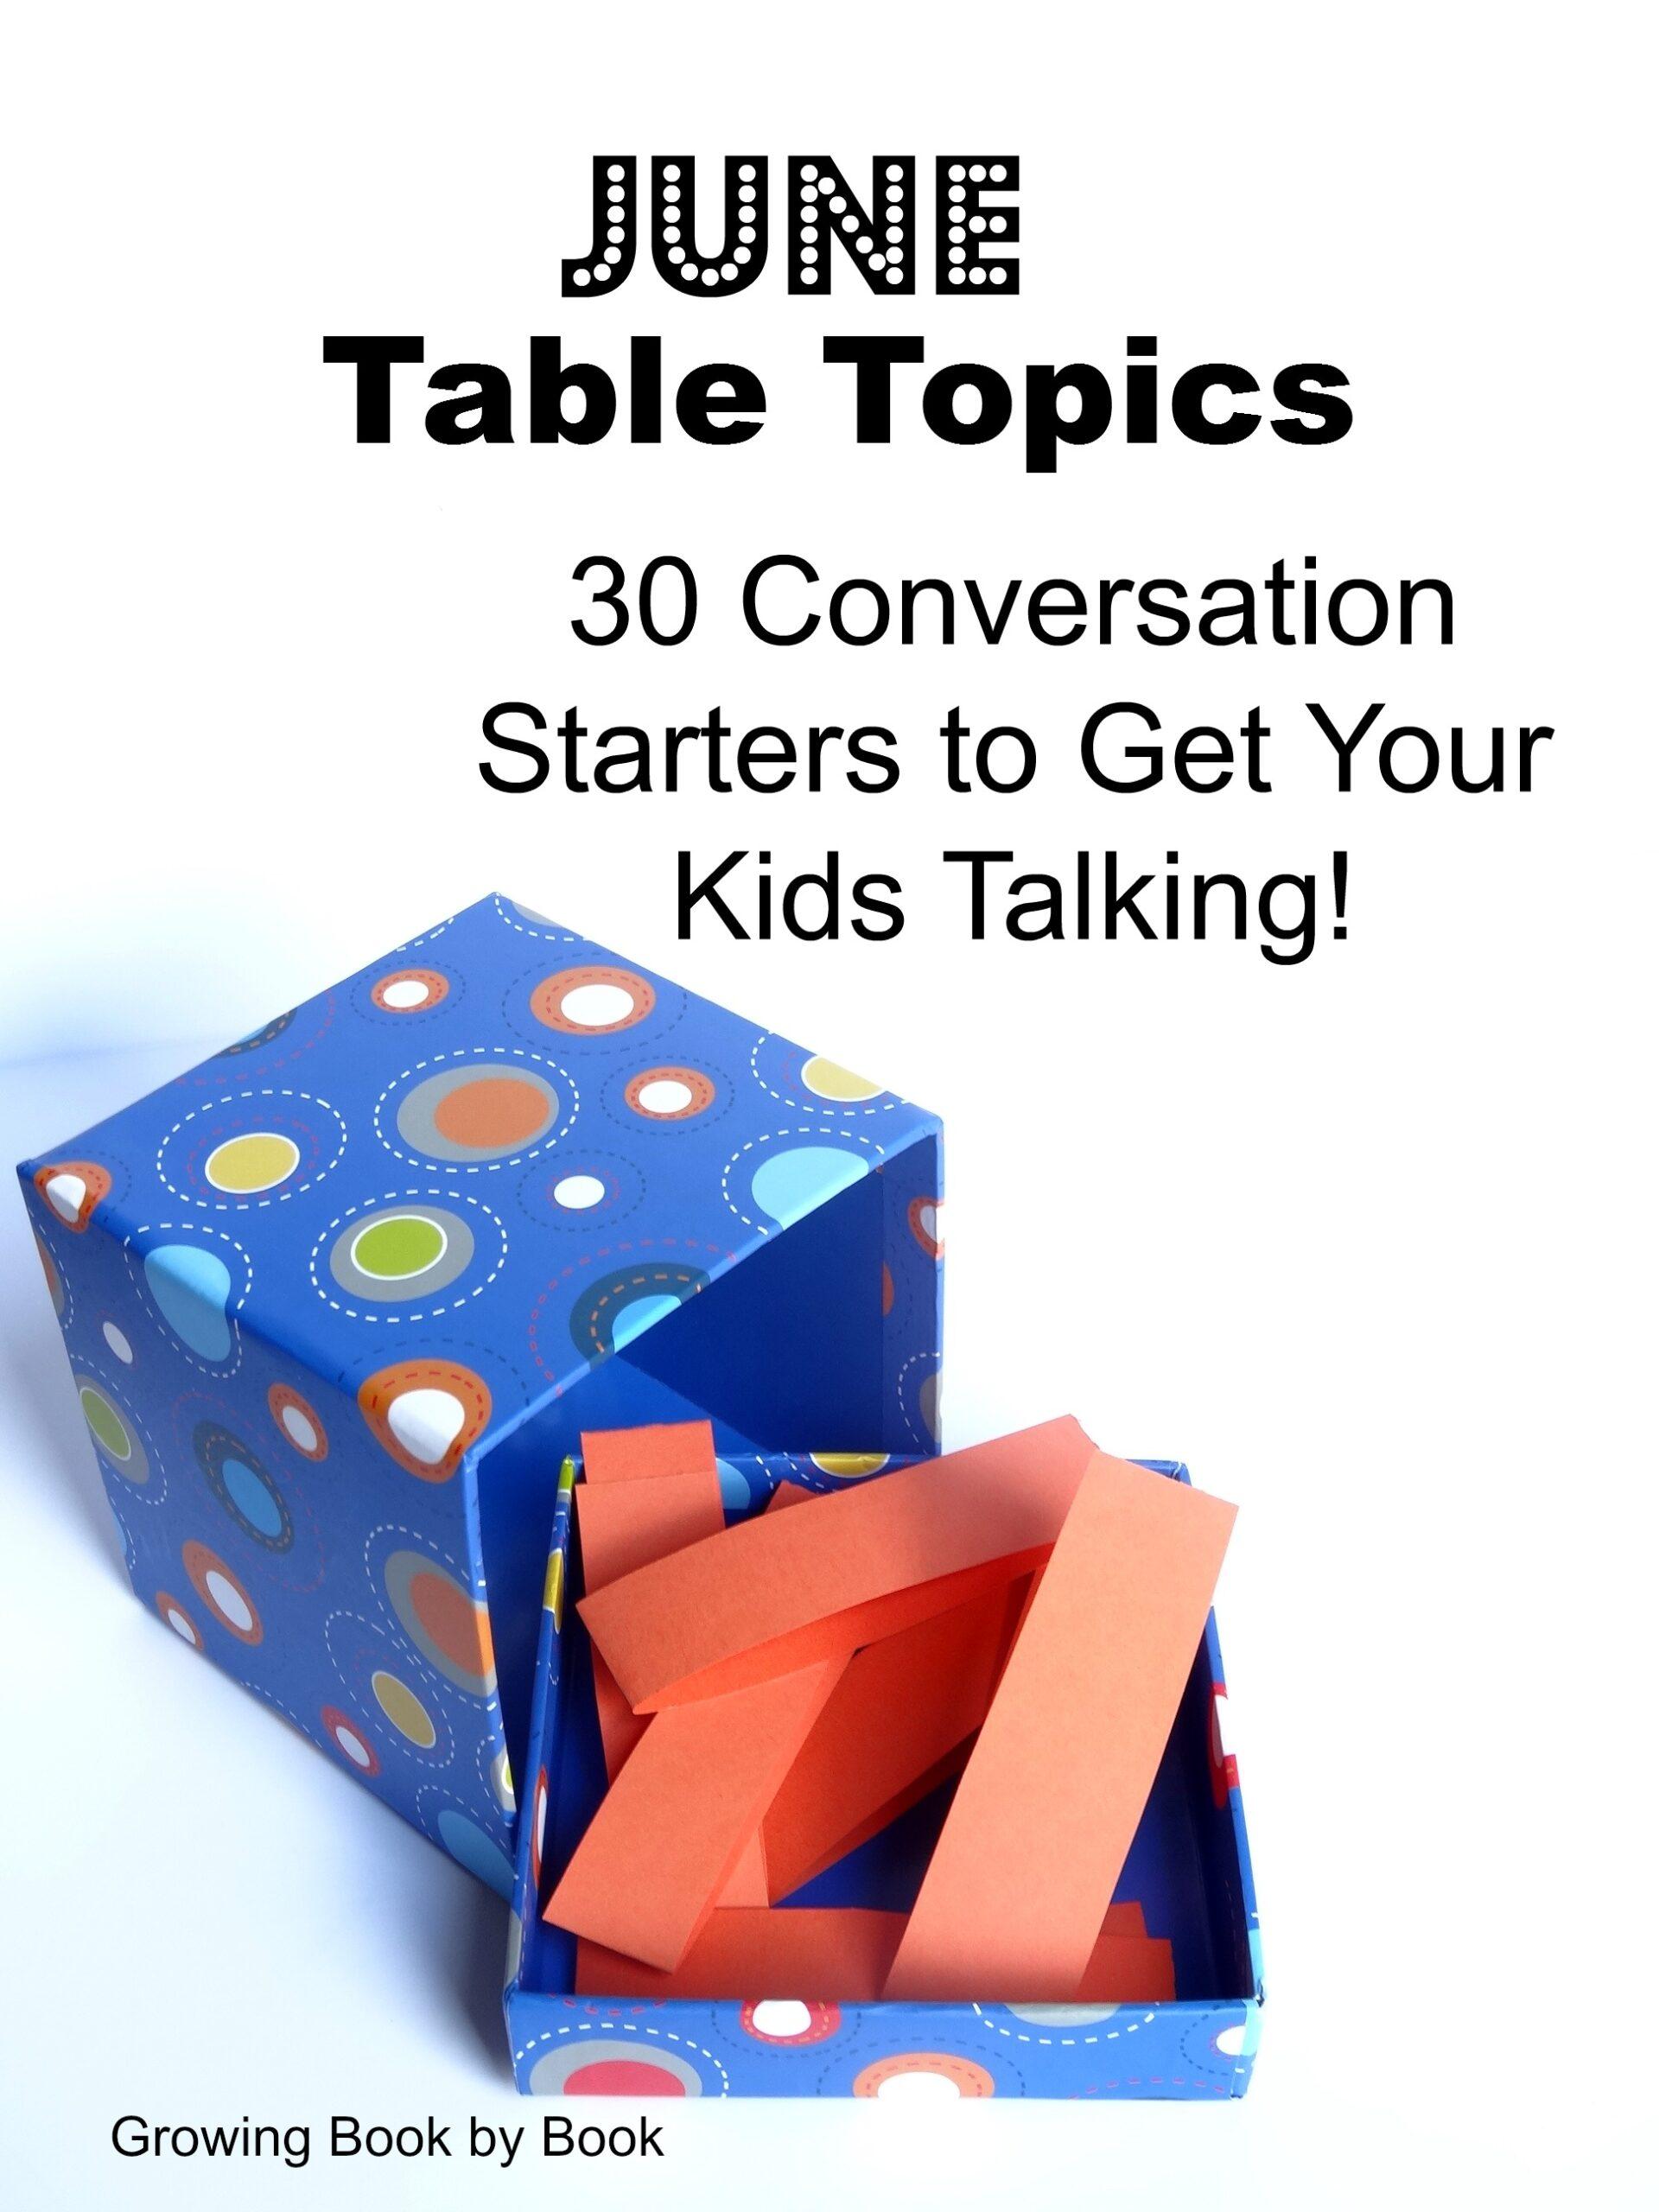 http://growingbookbybook.com/wp-content/uploads/2013/05/June-Table-Topics.jpg